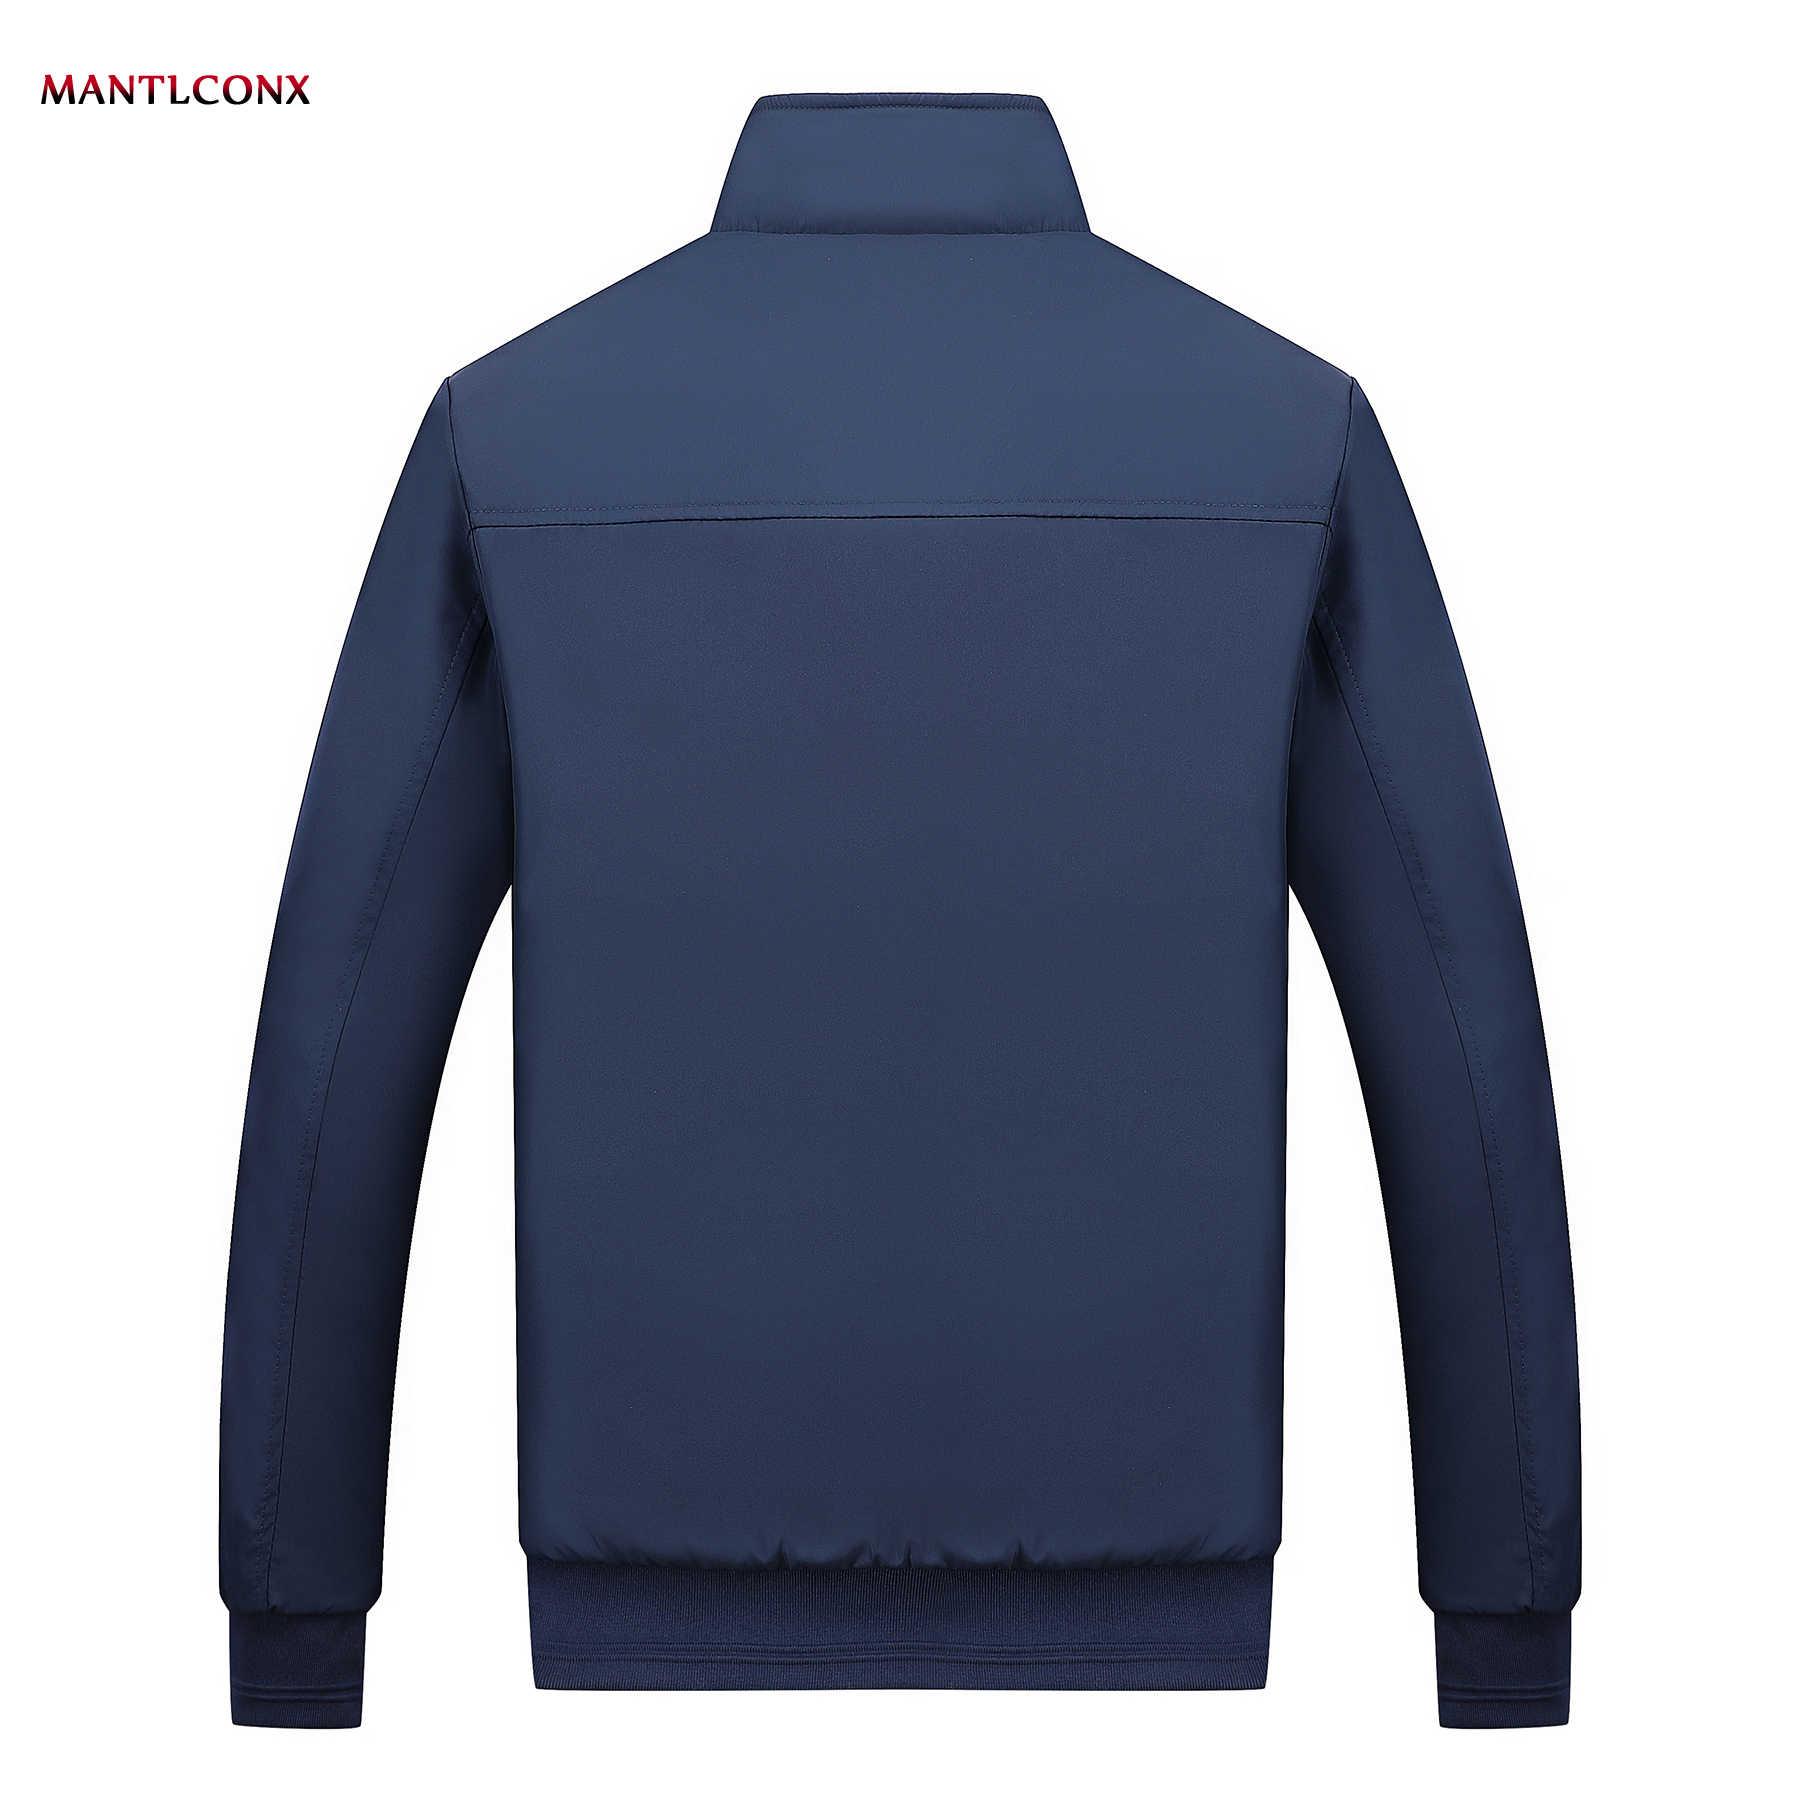 MANTLCONX Winter Jacket Men 2020 브랜드 캐주얼 남성 자켓 및 코트 두꺼운 남성 Outwear Jacket 남성 의류 Fleece Thicken Coats